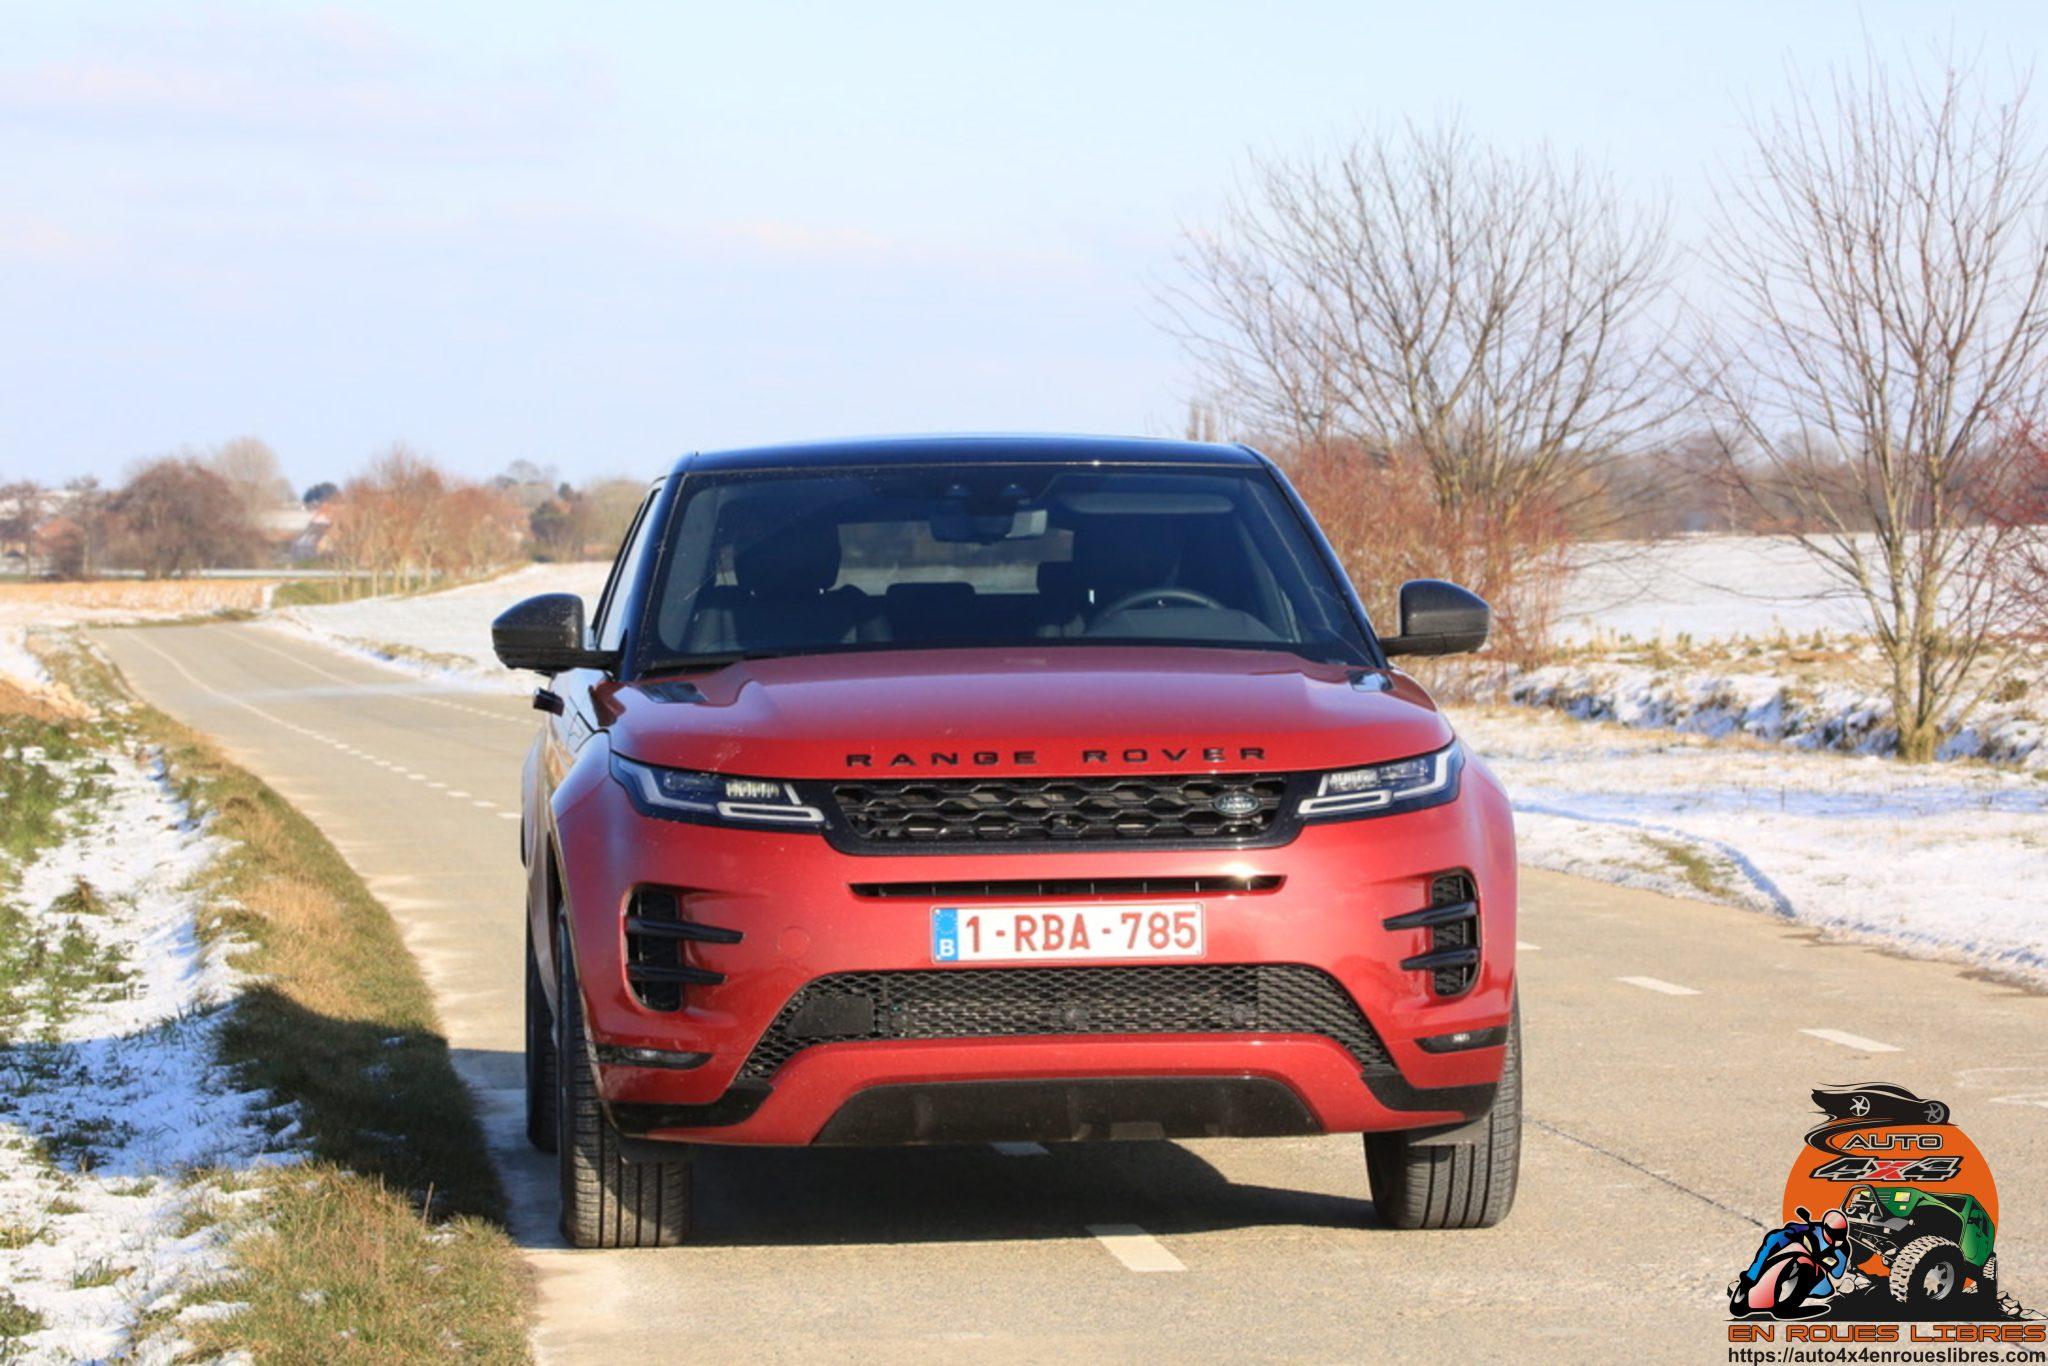 L'hybride plug in à la façon British : Essai du Range Rover Evoque P300e R-Dynamic SE